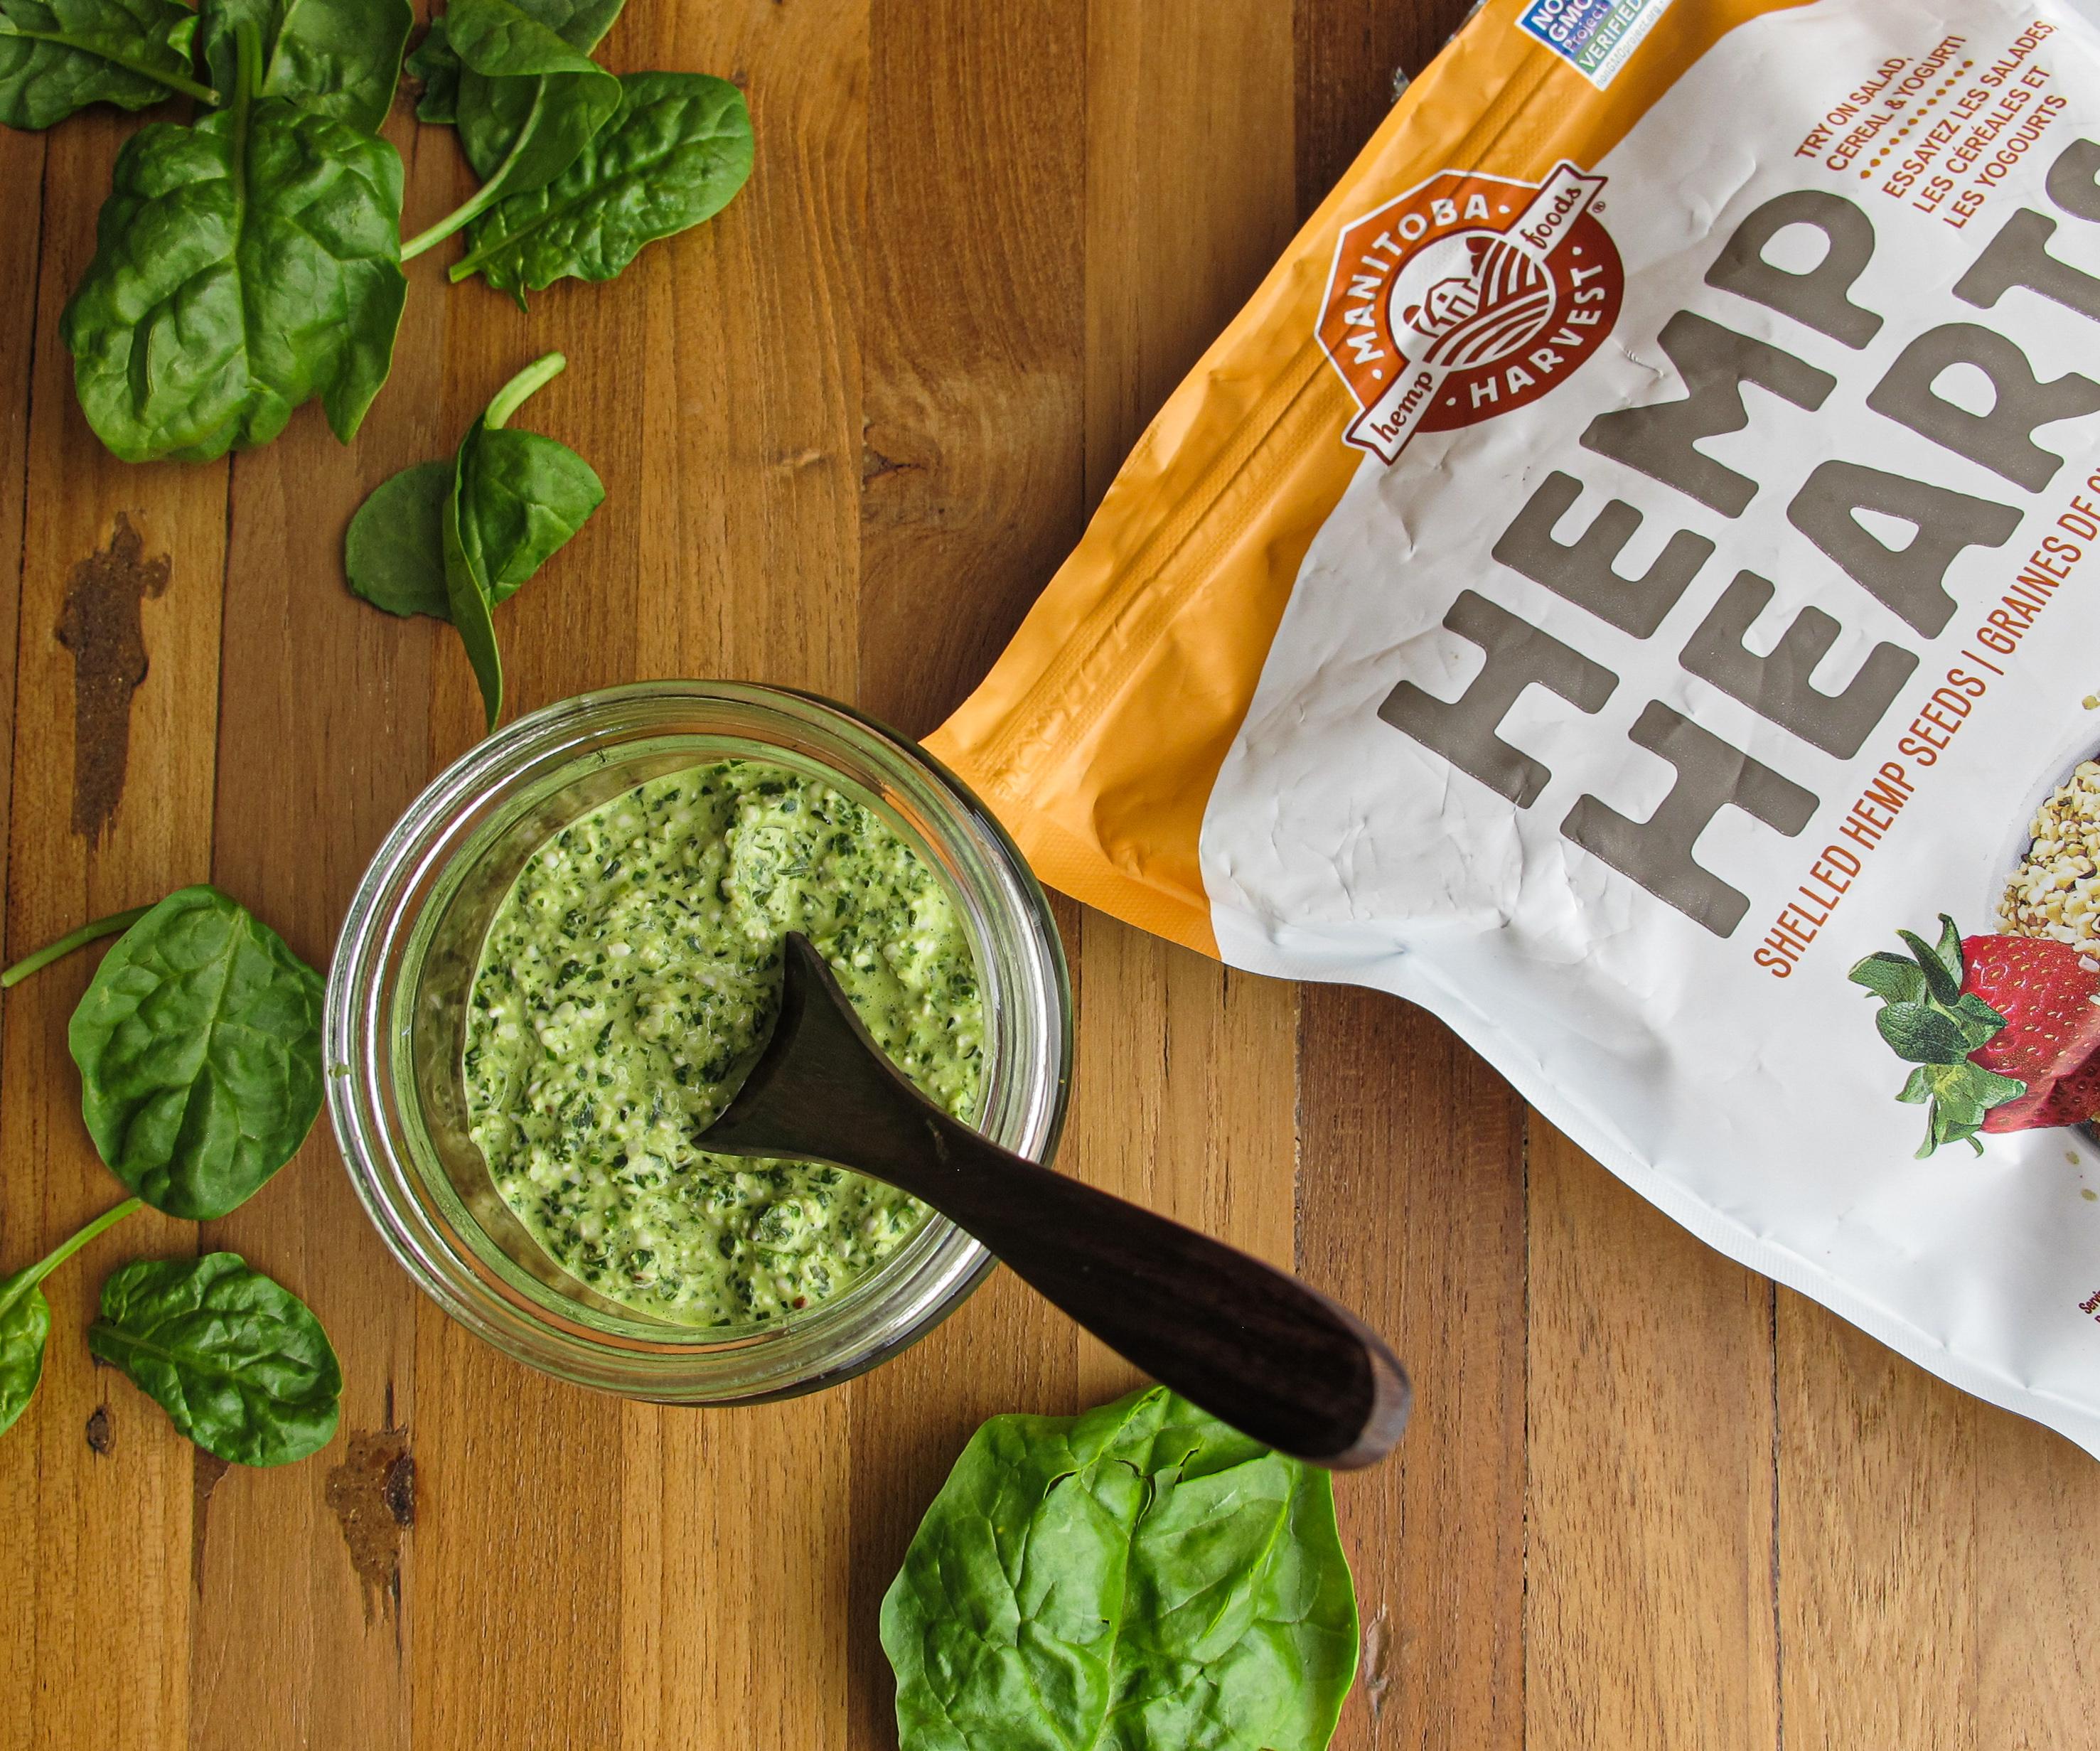 Nut-Free Pesto, Basil, Spinach, Hemp Hearts